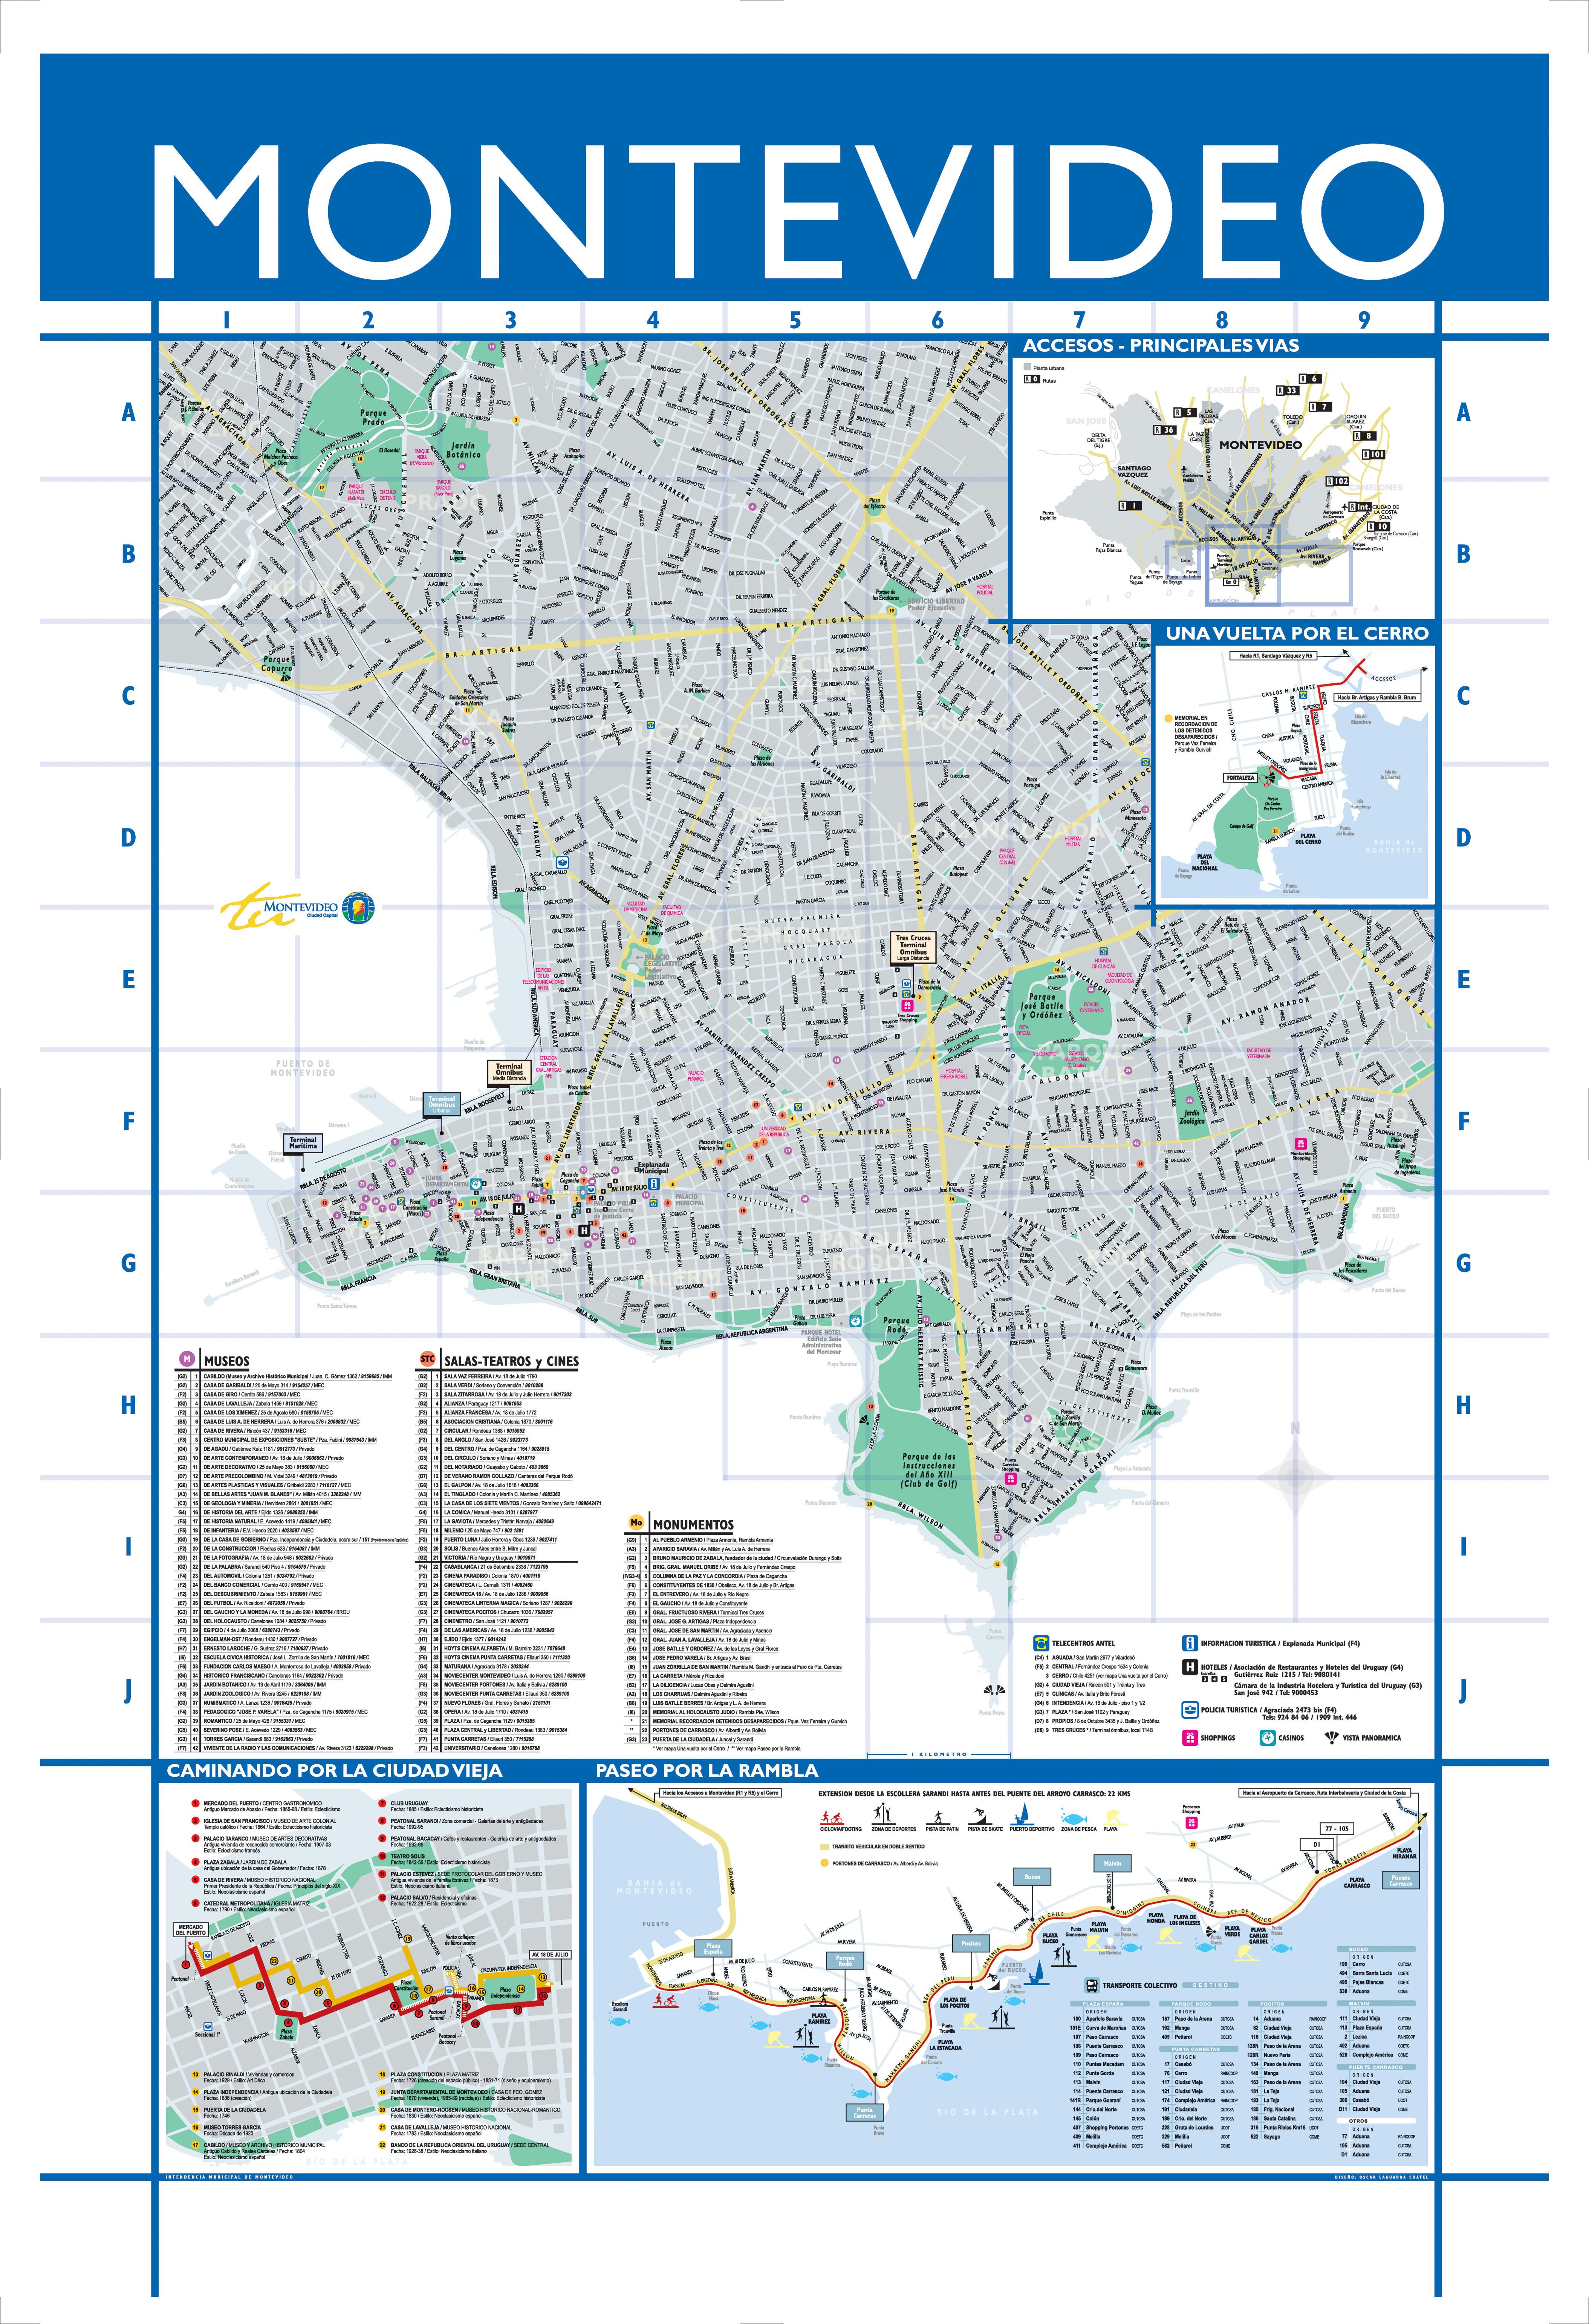 Image of: Maps Of Montevideo Map Uruguay Mapa Owje Com